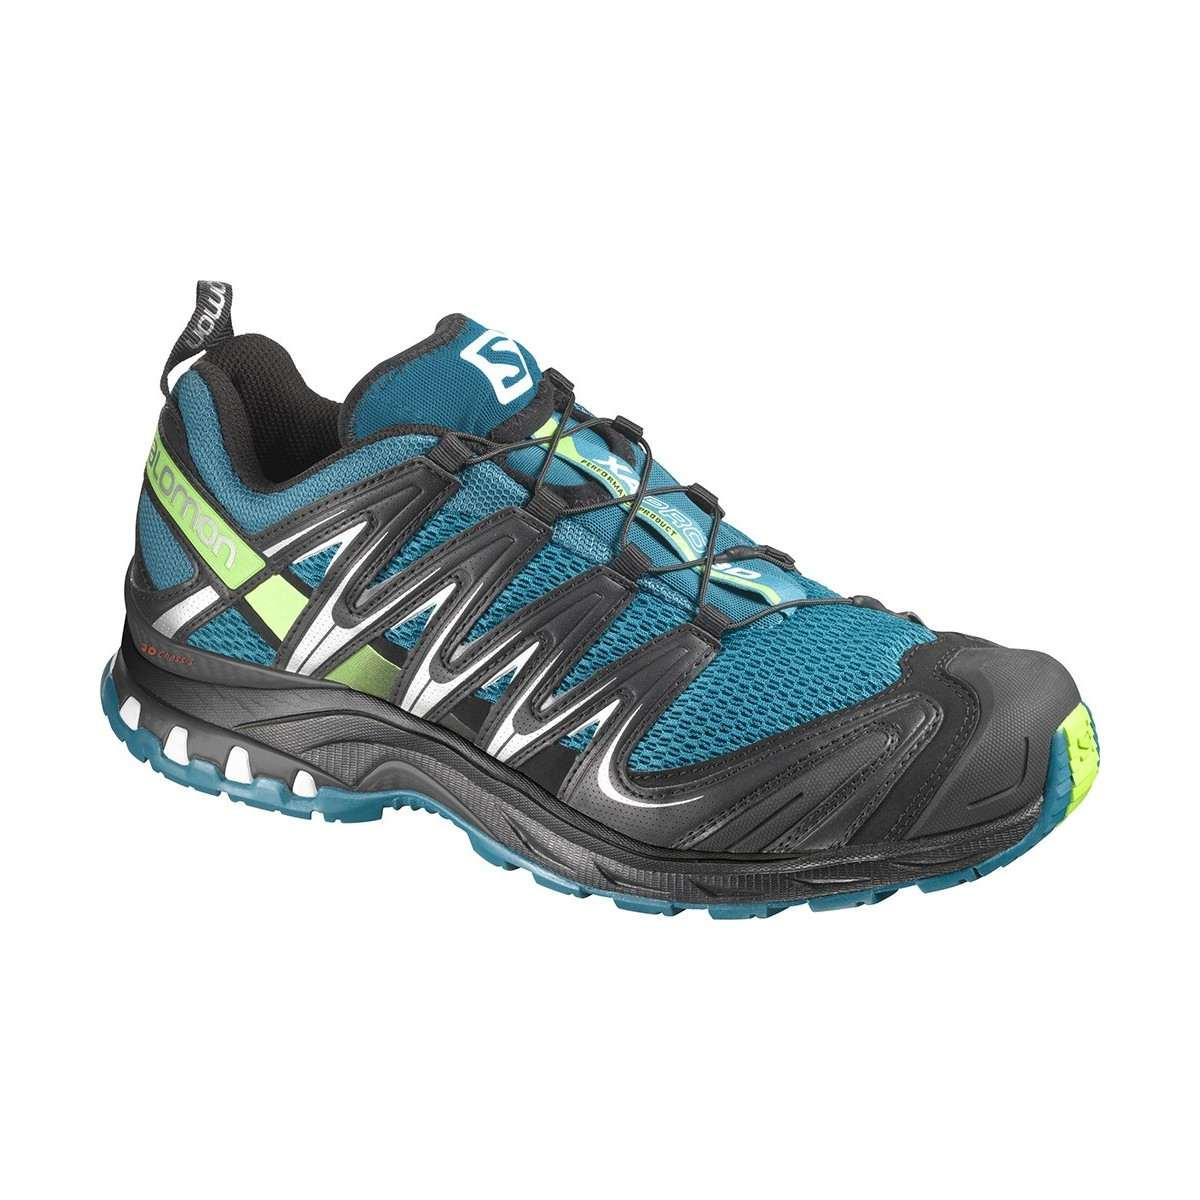 Salomon XA Pro 3D Ultra 2 Men's Running Shoe / Trail